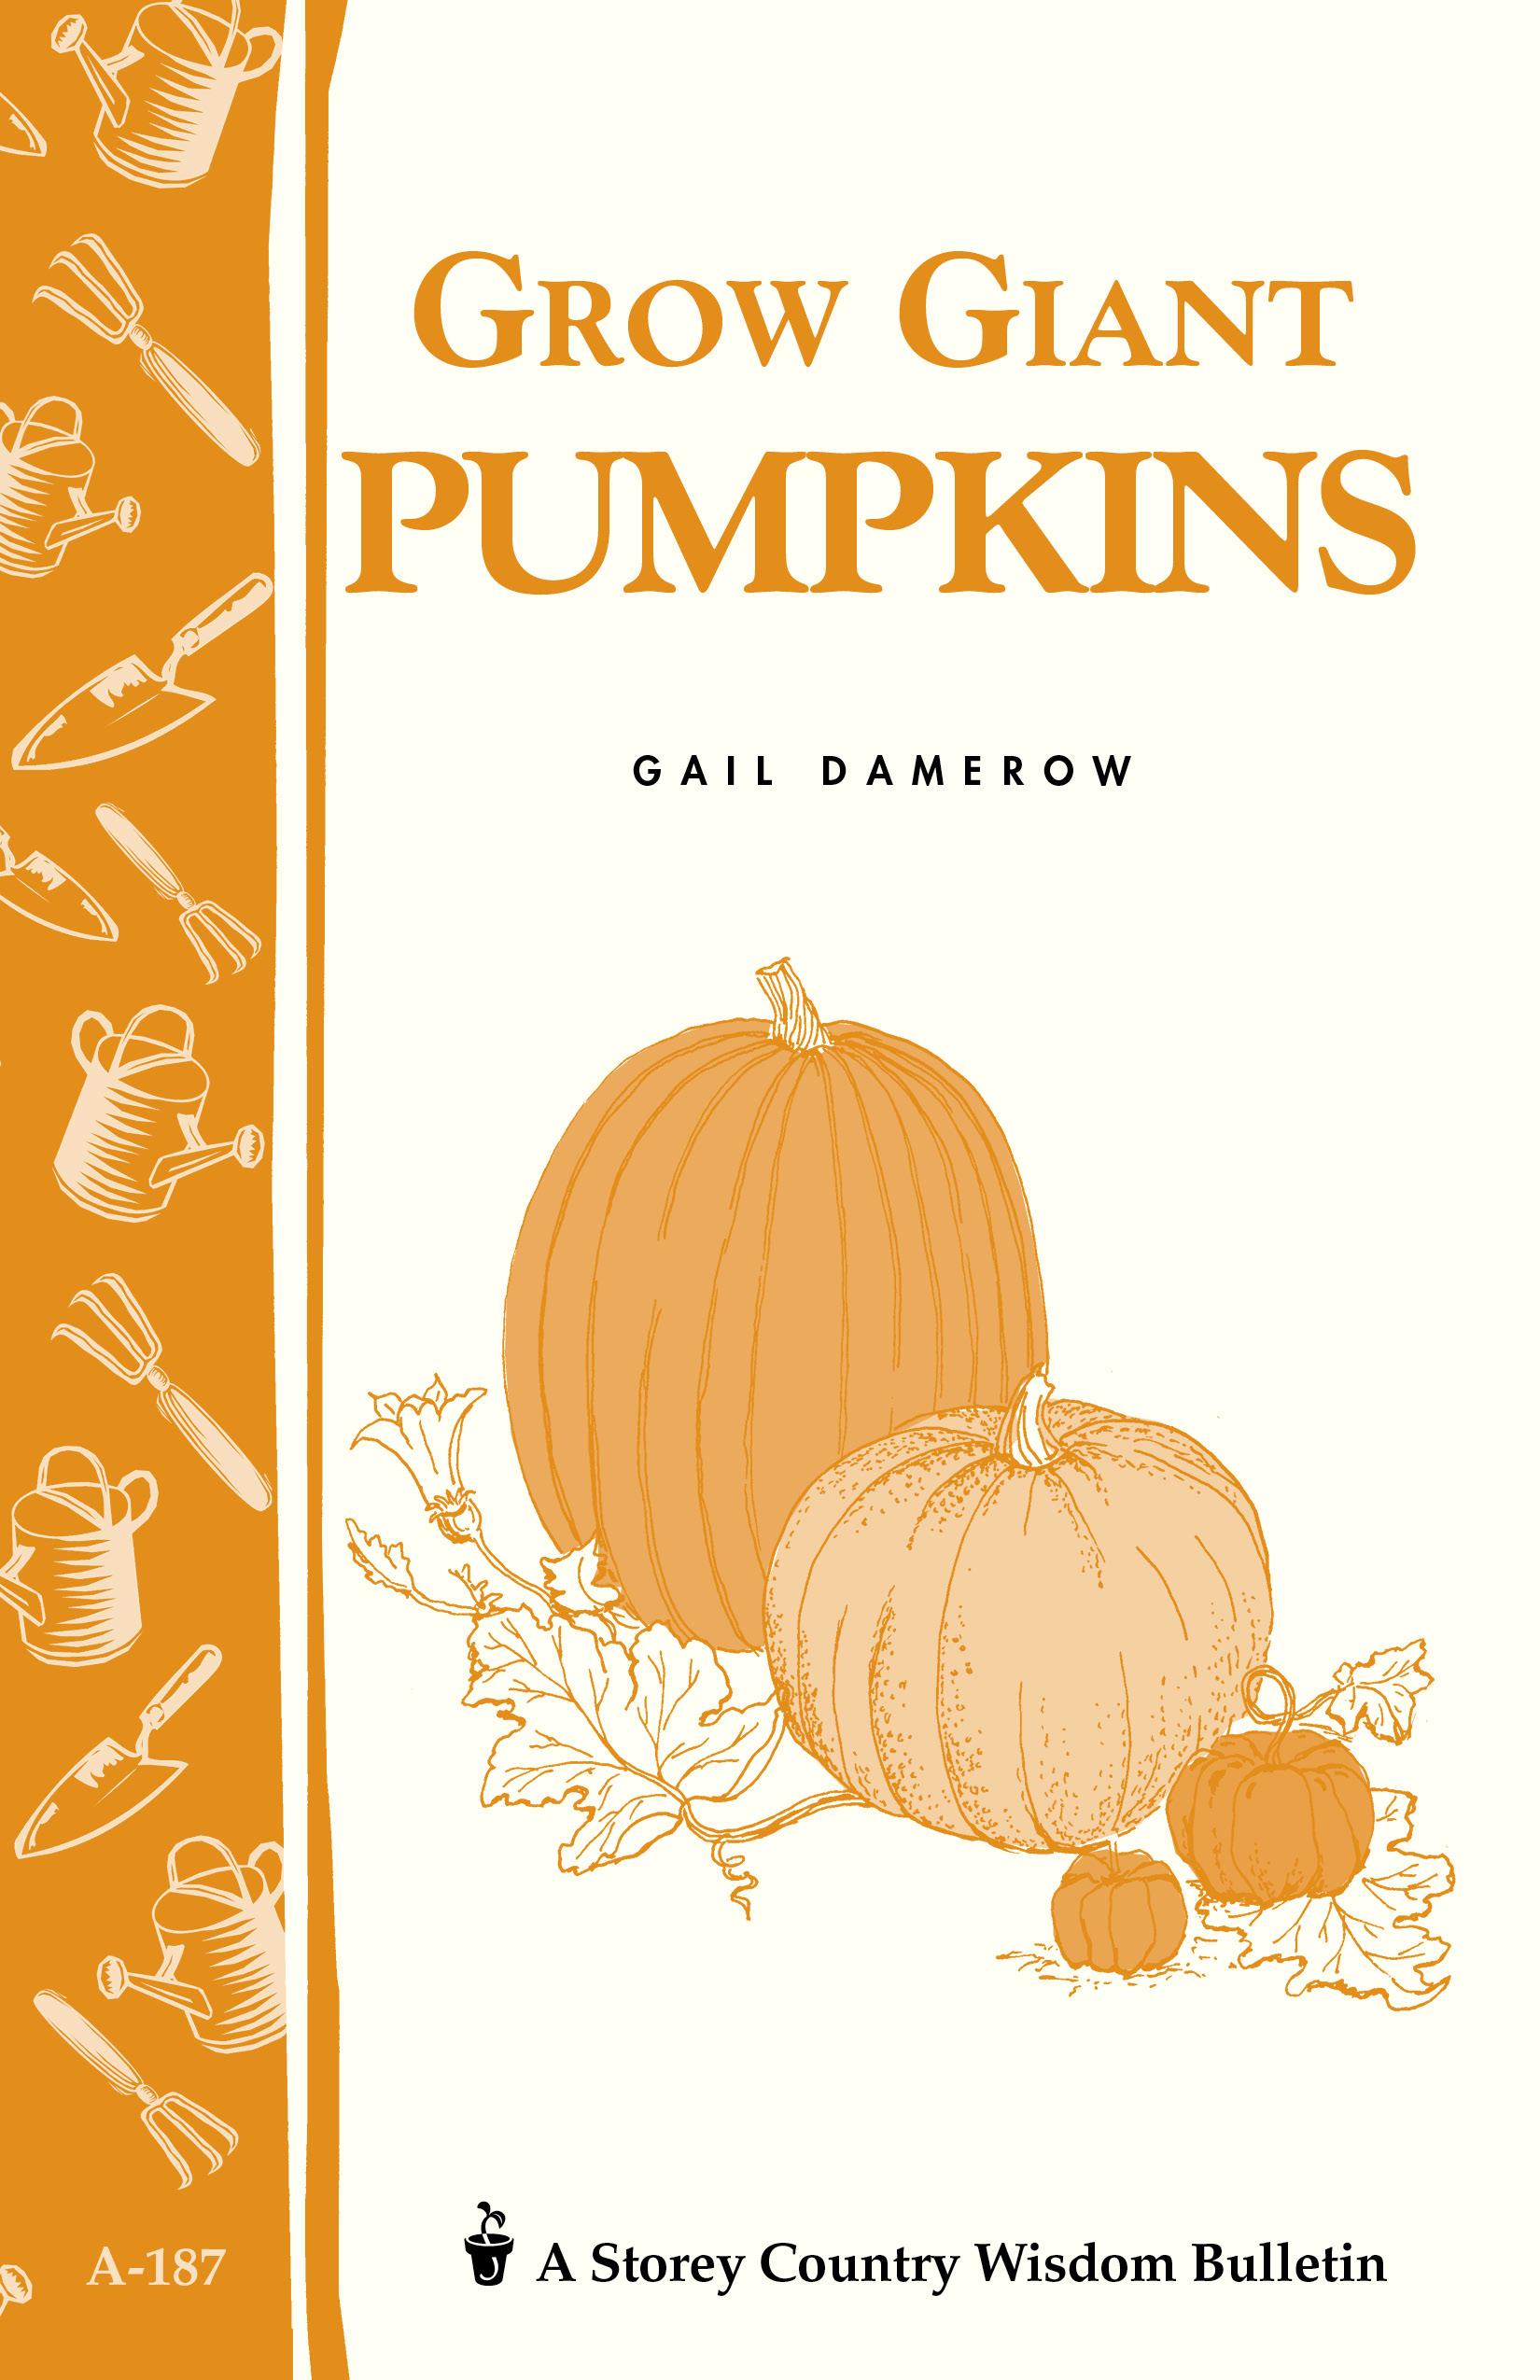 Grow Giant Pumpkins Storey's Country Wisdom Bulletin A-187 - Gail Damerow